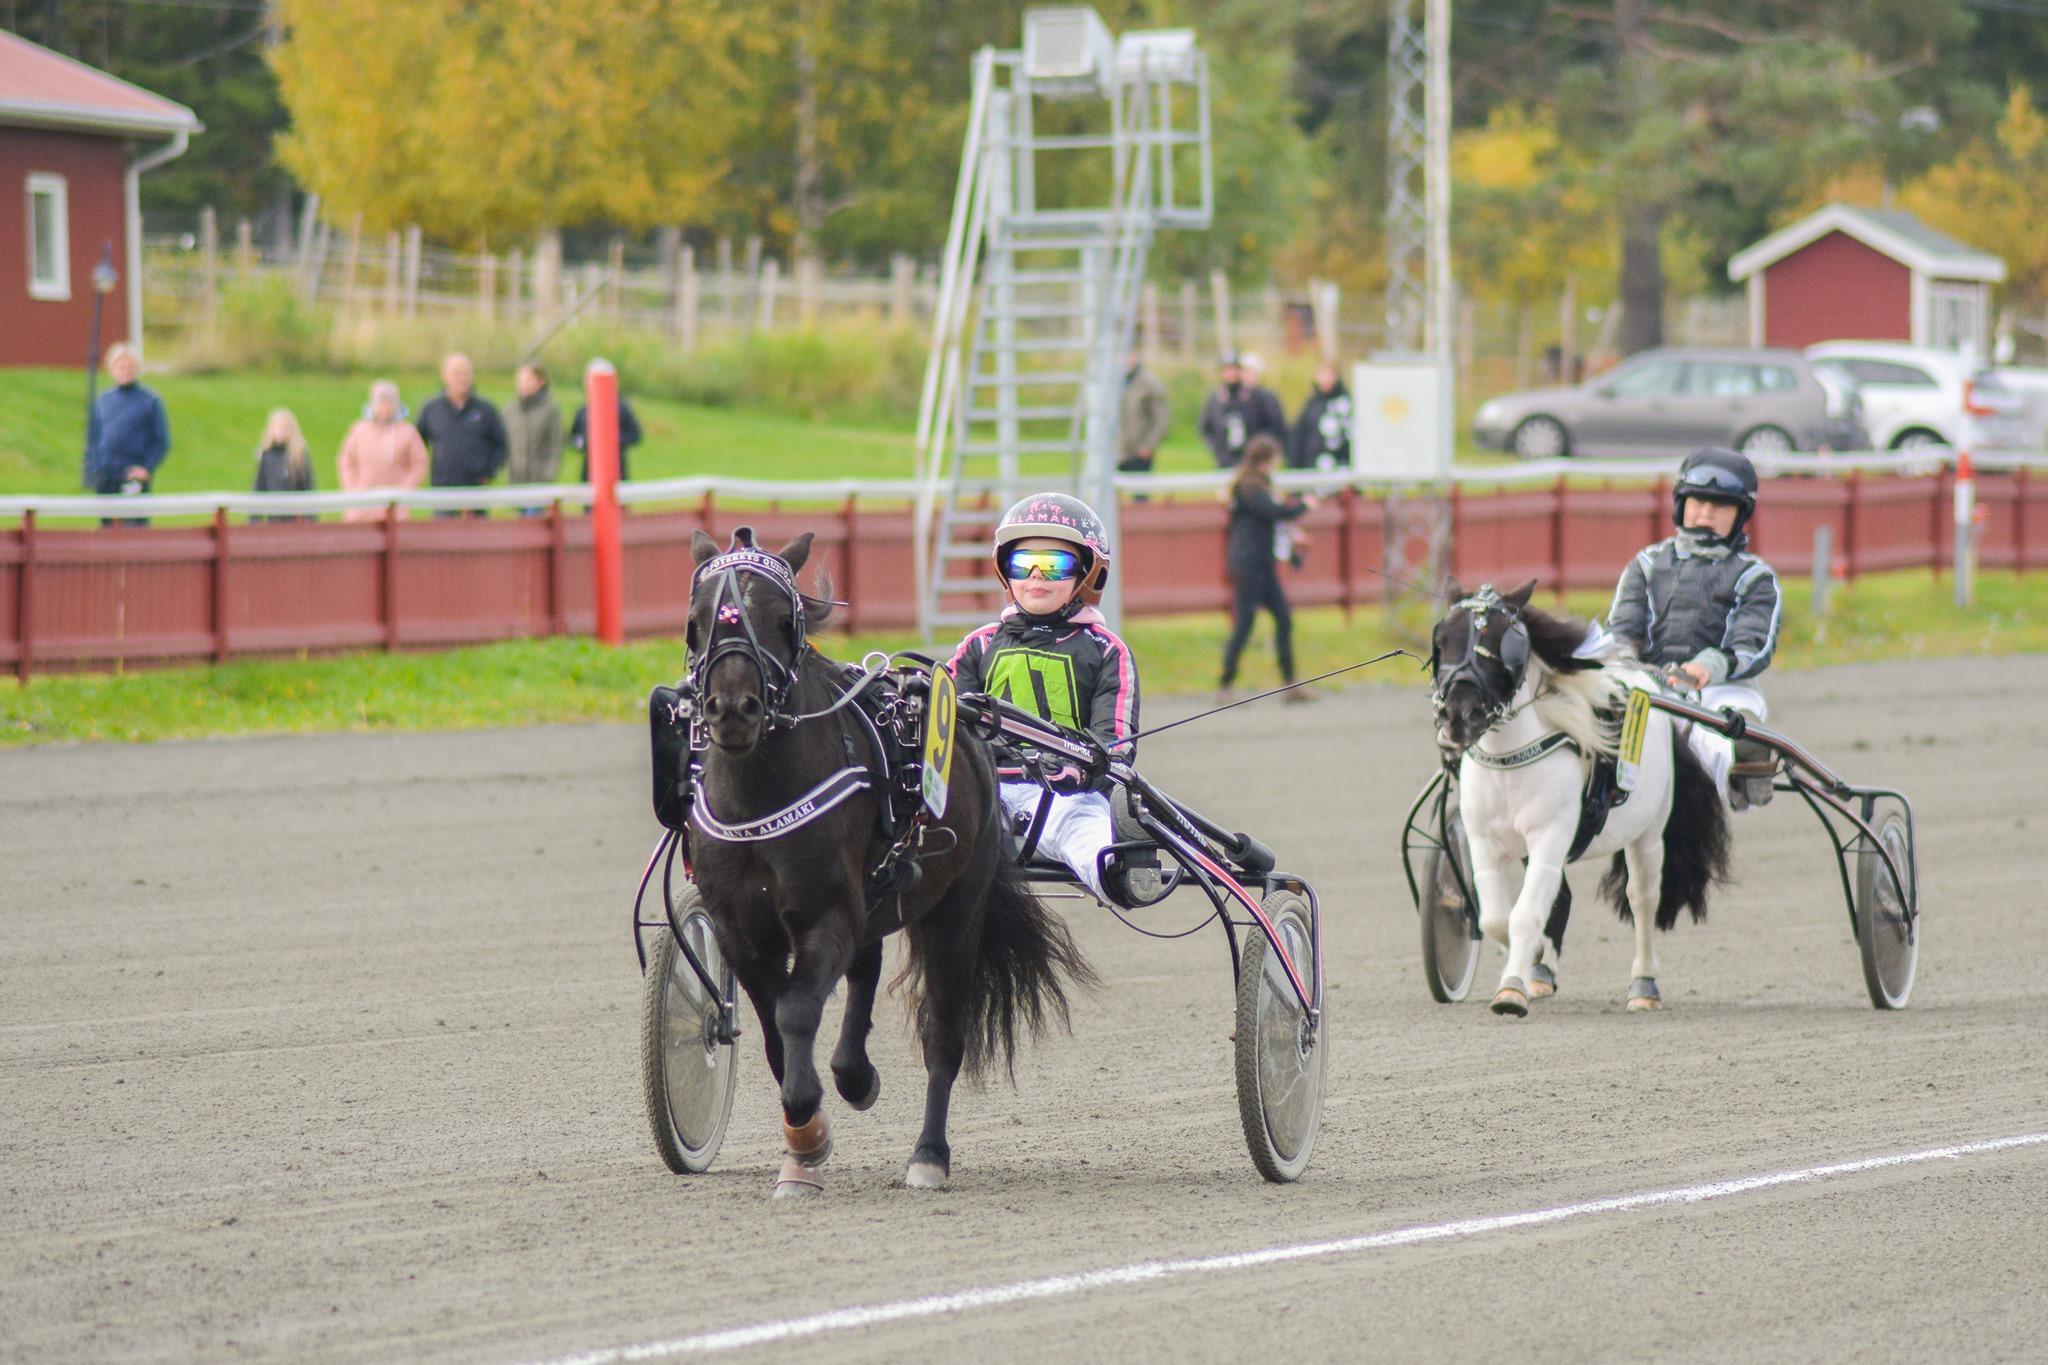 Höstlig tävlingsdag i Skellefteå